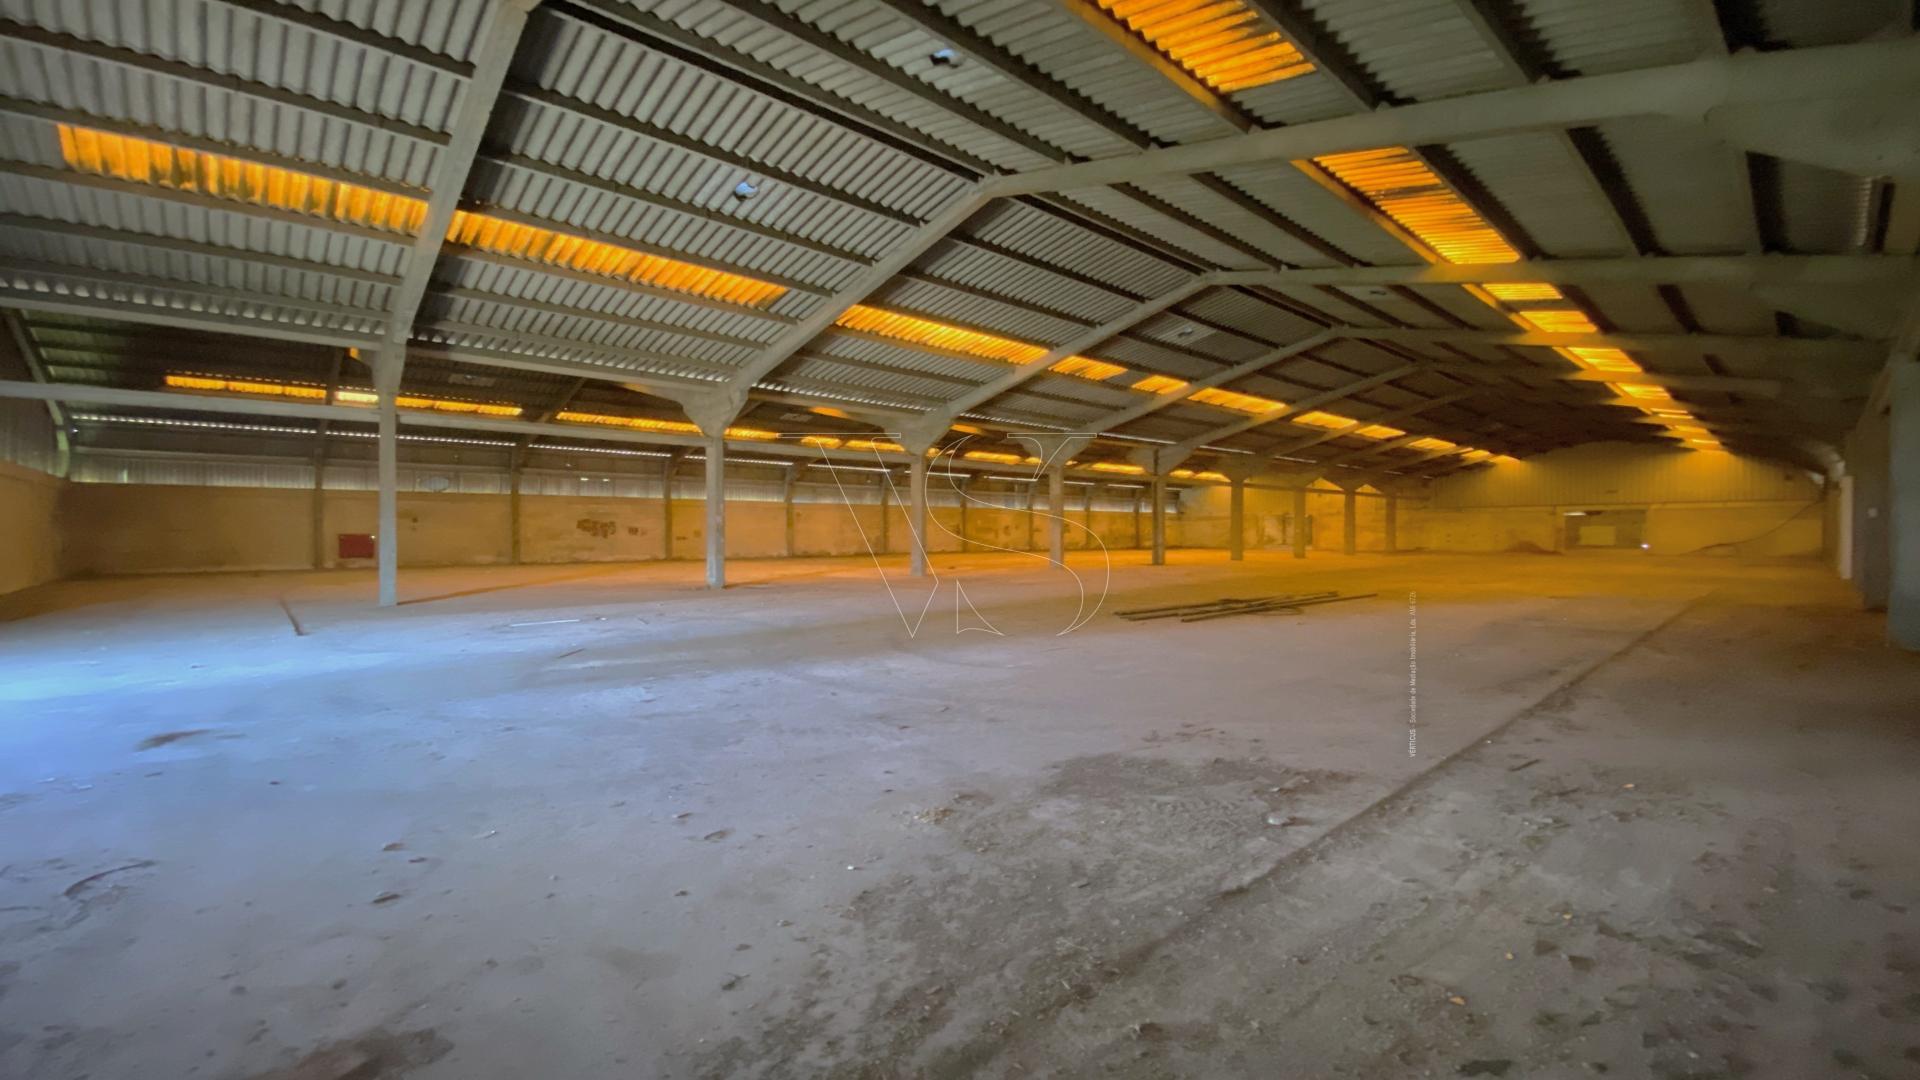 Unidade Industrial c/ 6159 m2, implantados num terreno de 15916 m2 em Gondomar